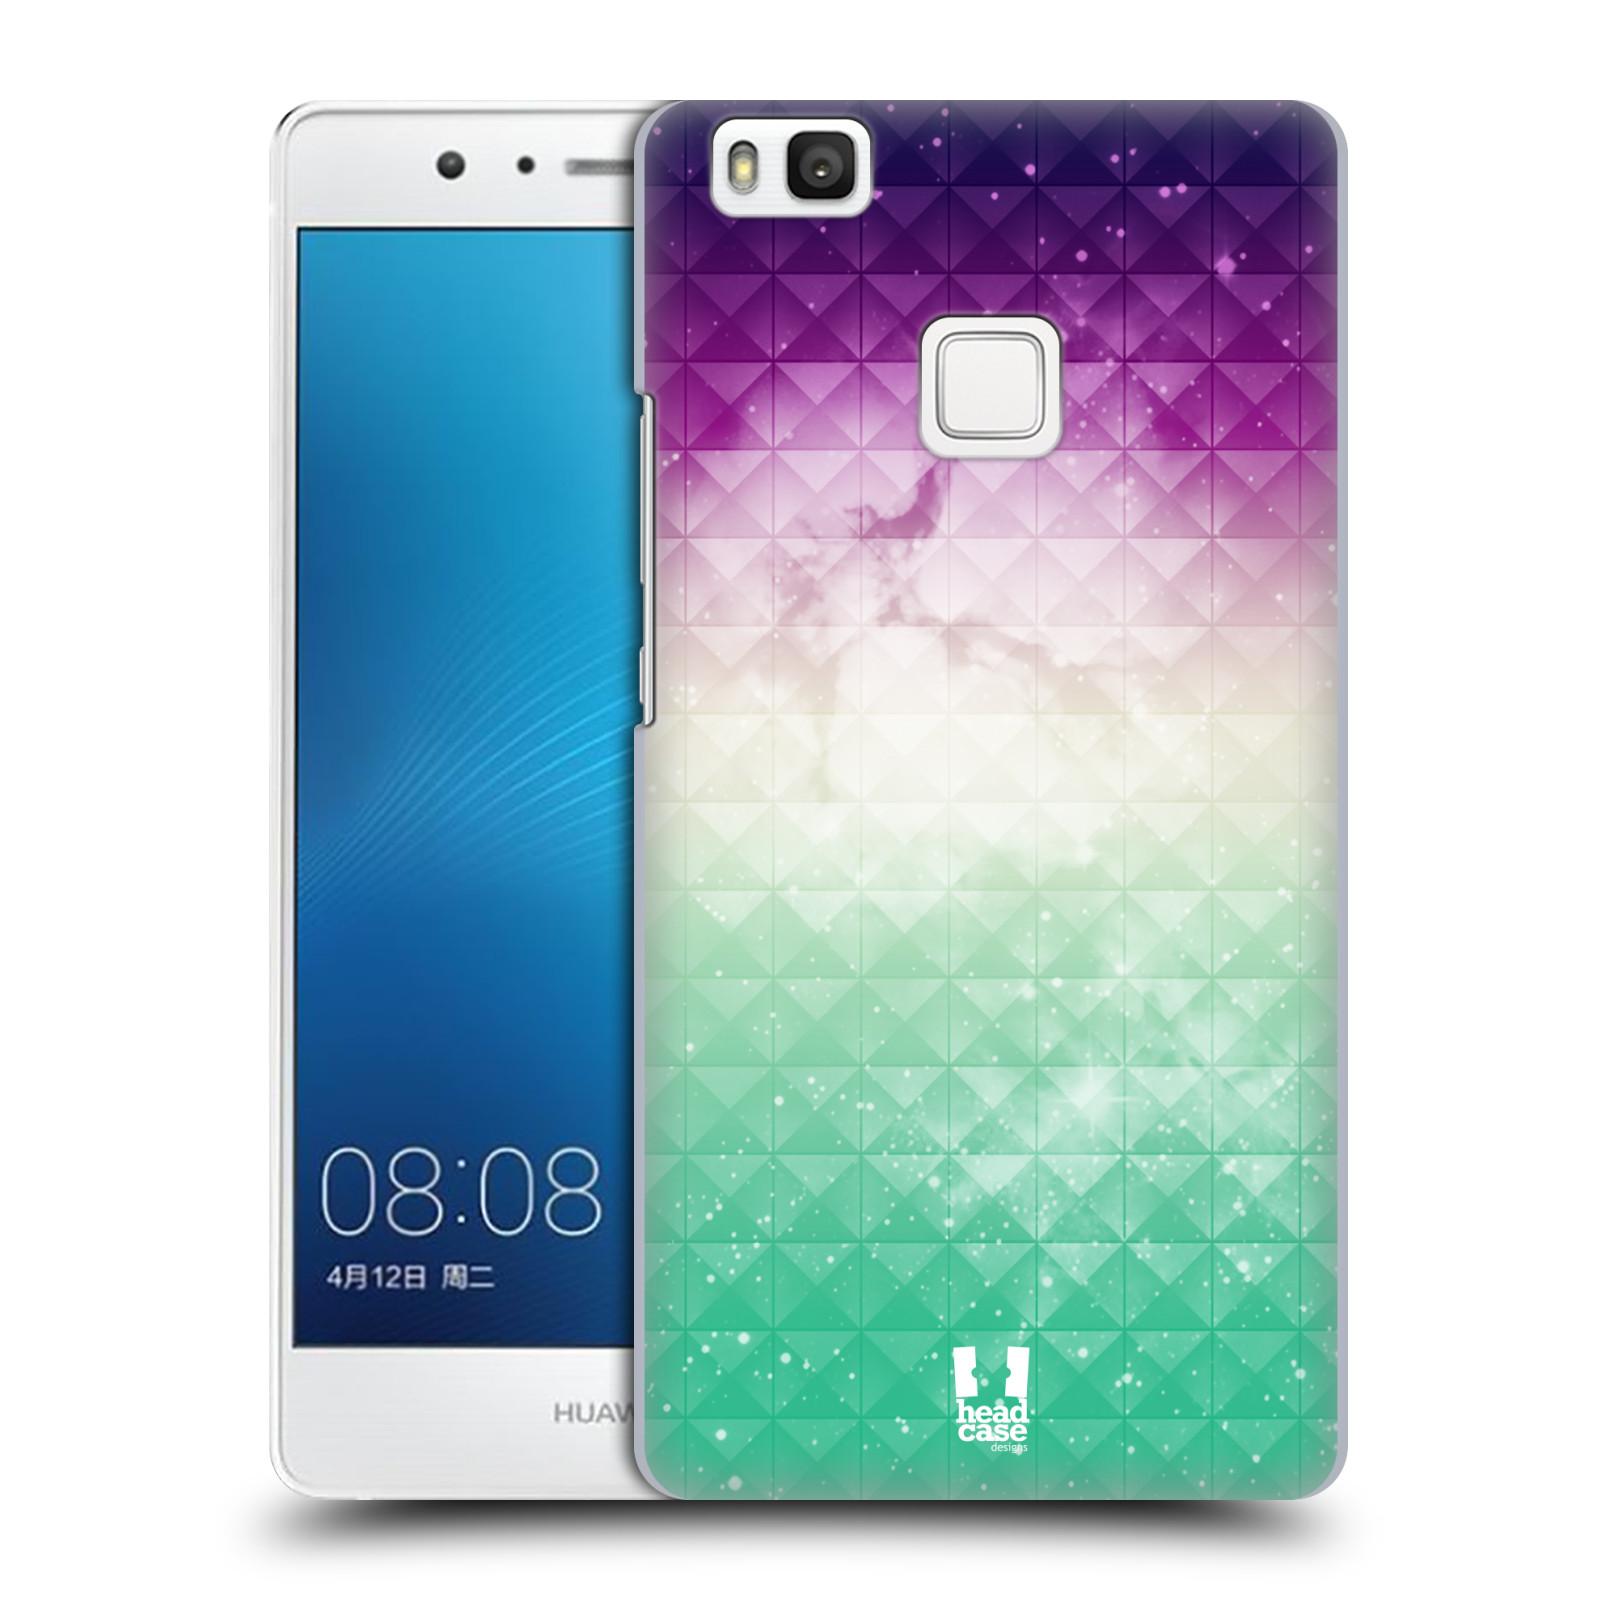 HEAD CASE plastový obal na mobil Huawei P9 LITE / P9 LITE DUAL SIM vzor Hvězdná obloha hvězdy a slunce FIALOVÁ A ZELENÁ